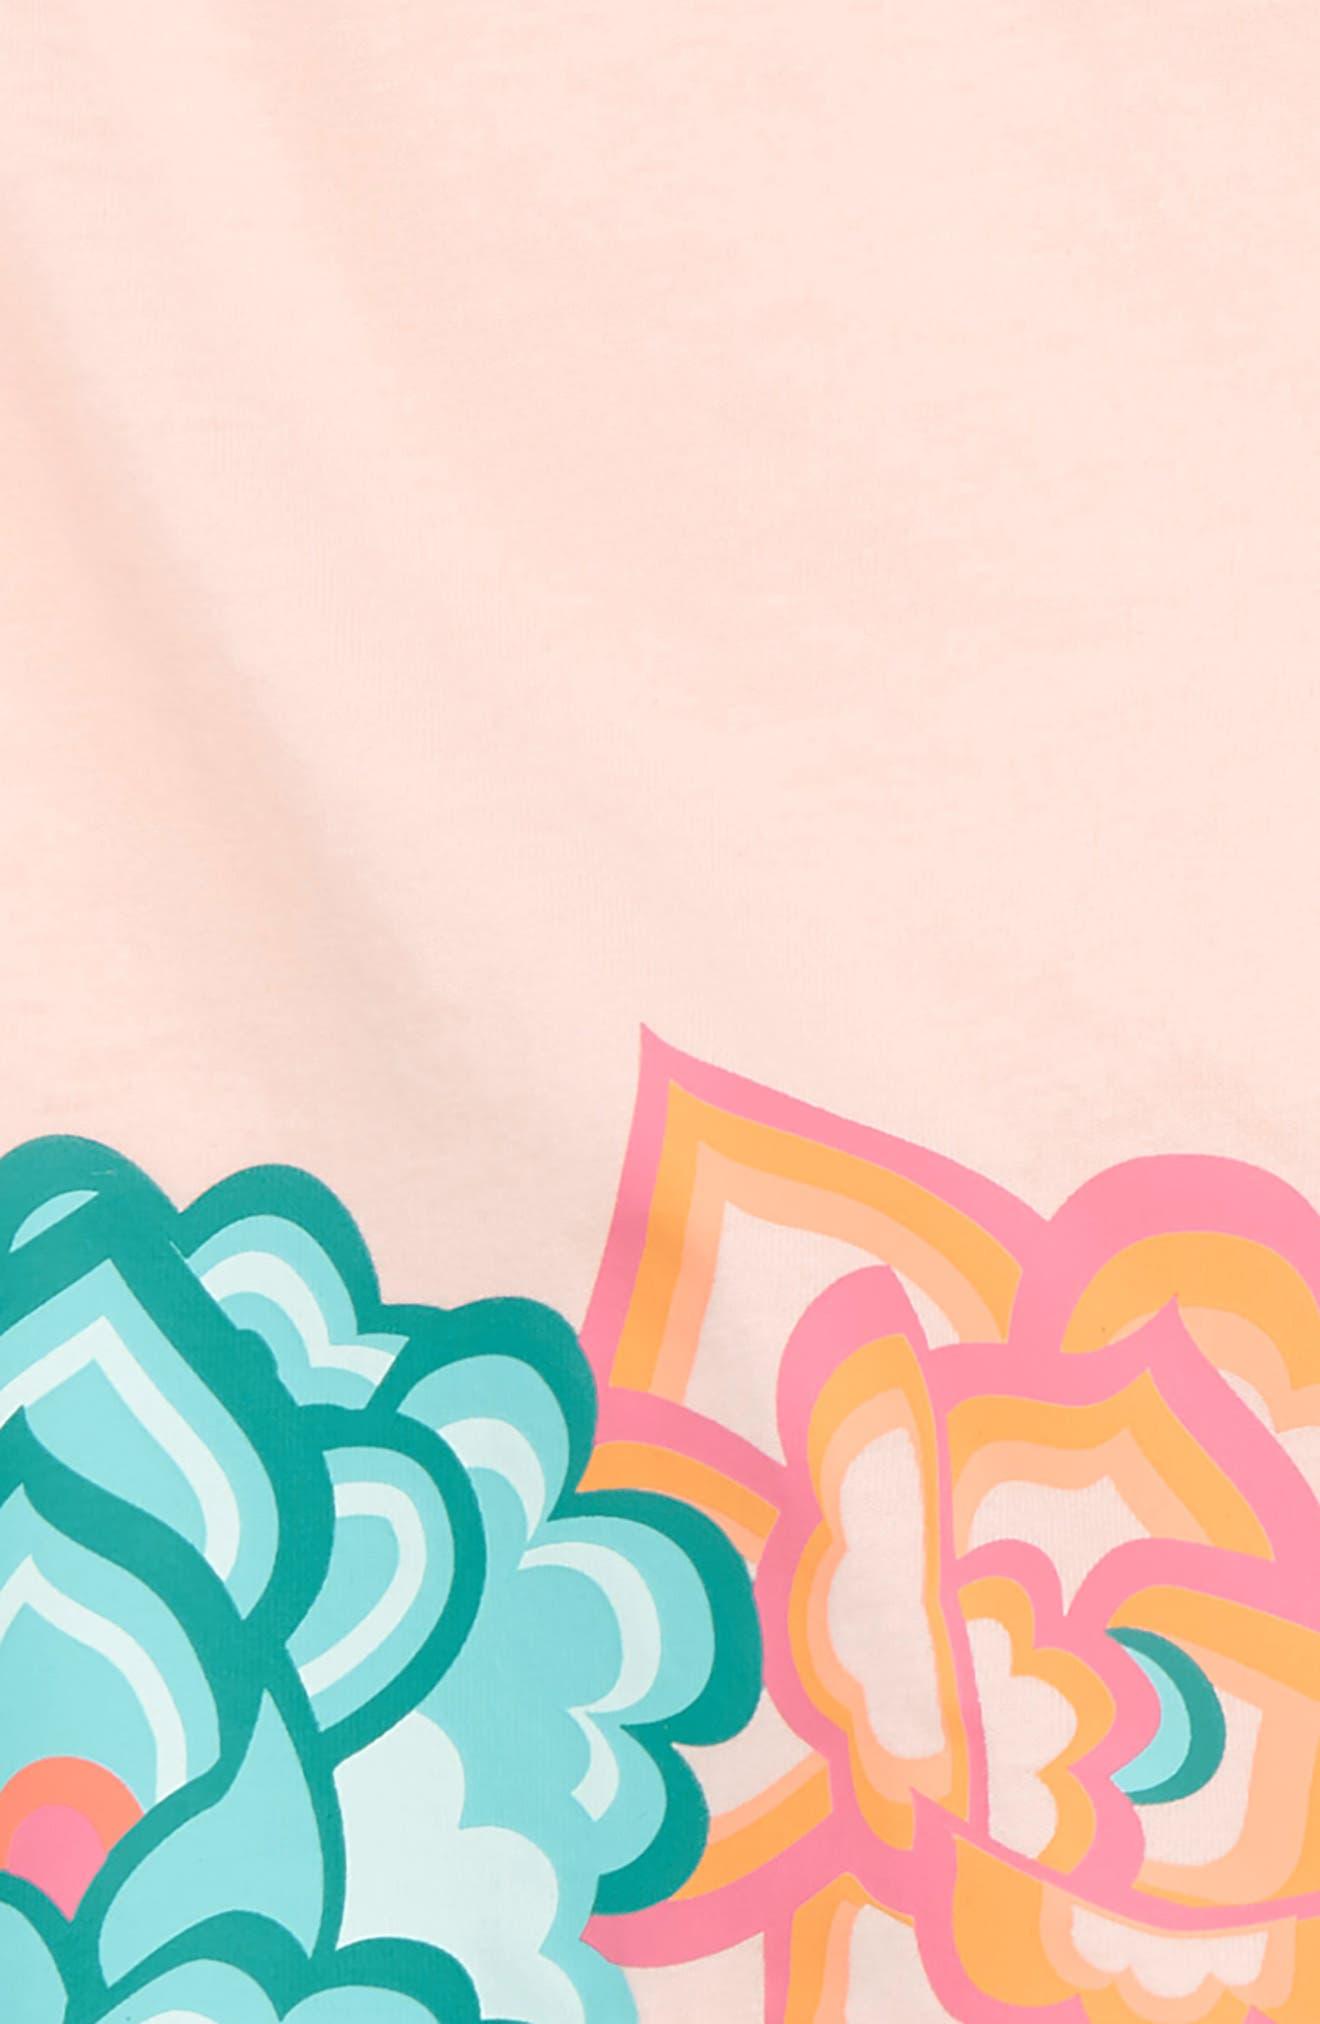 Floral Ruffle Top & Shorts Set,                             Alternate thumbnail 2, color,                             Pink Gloss